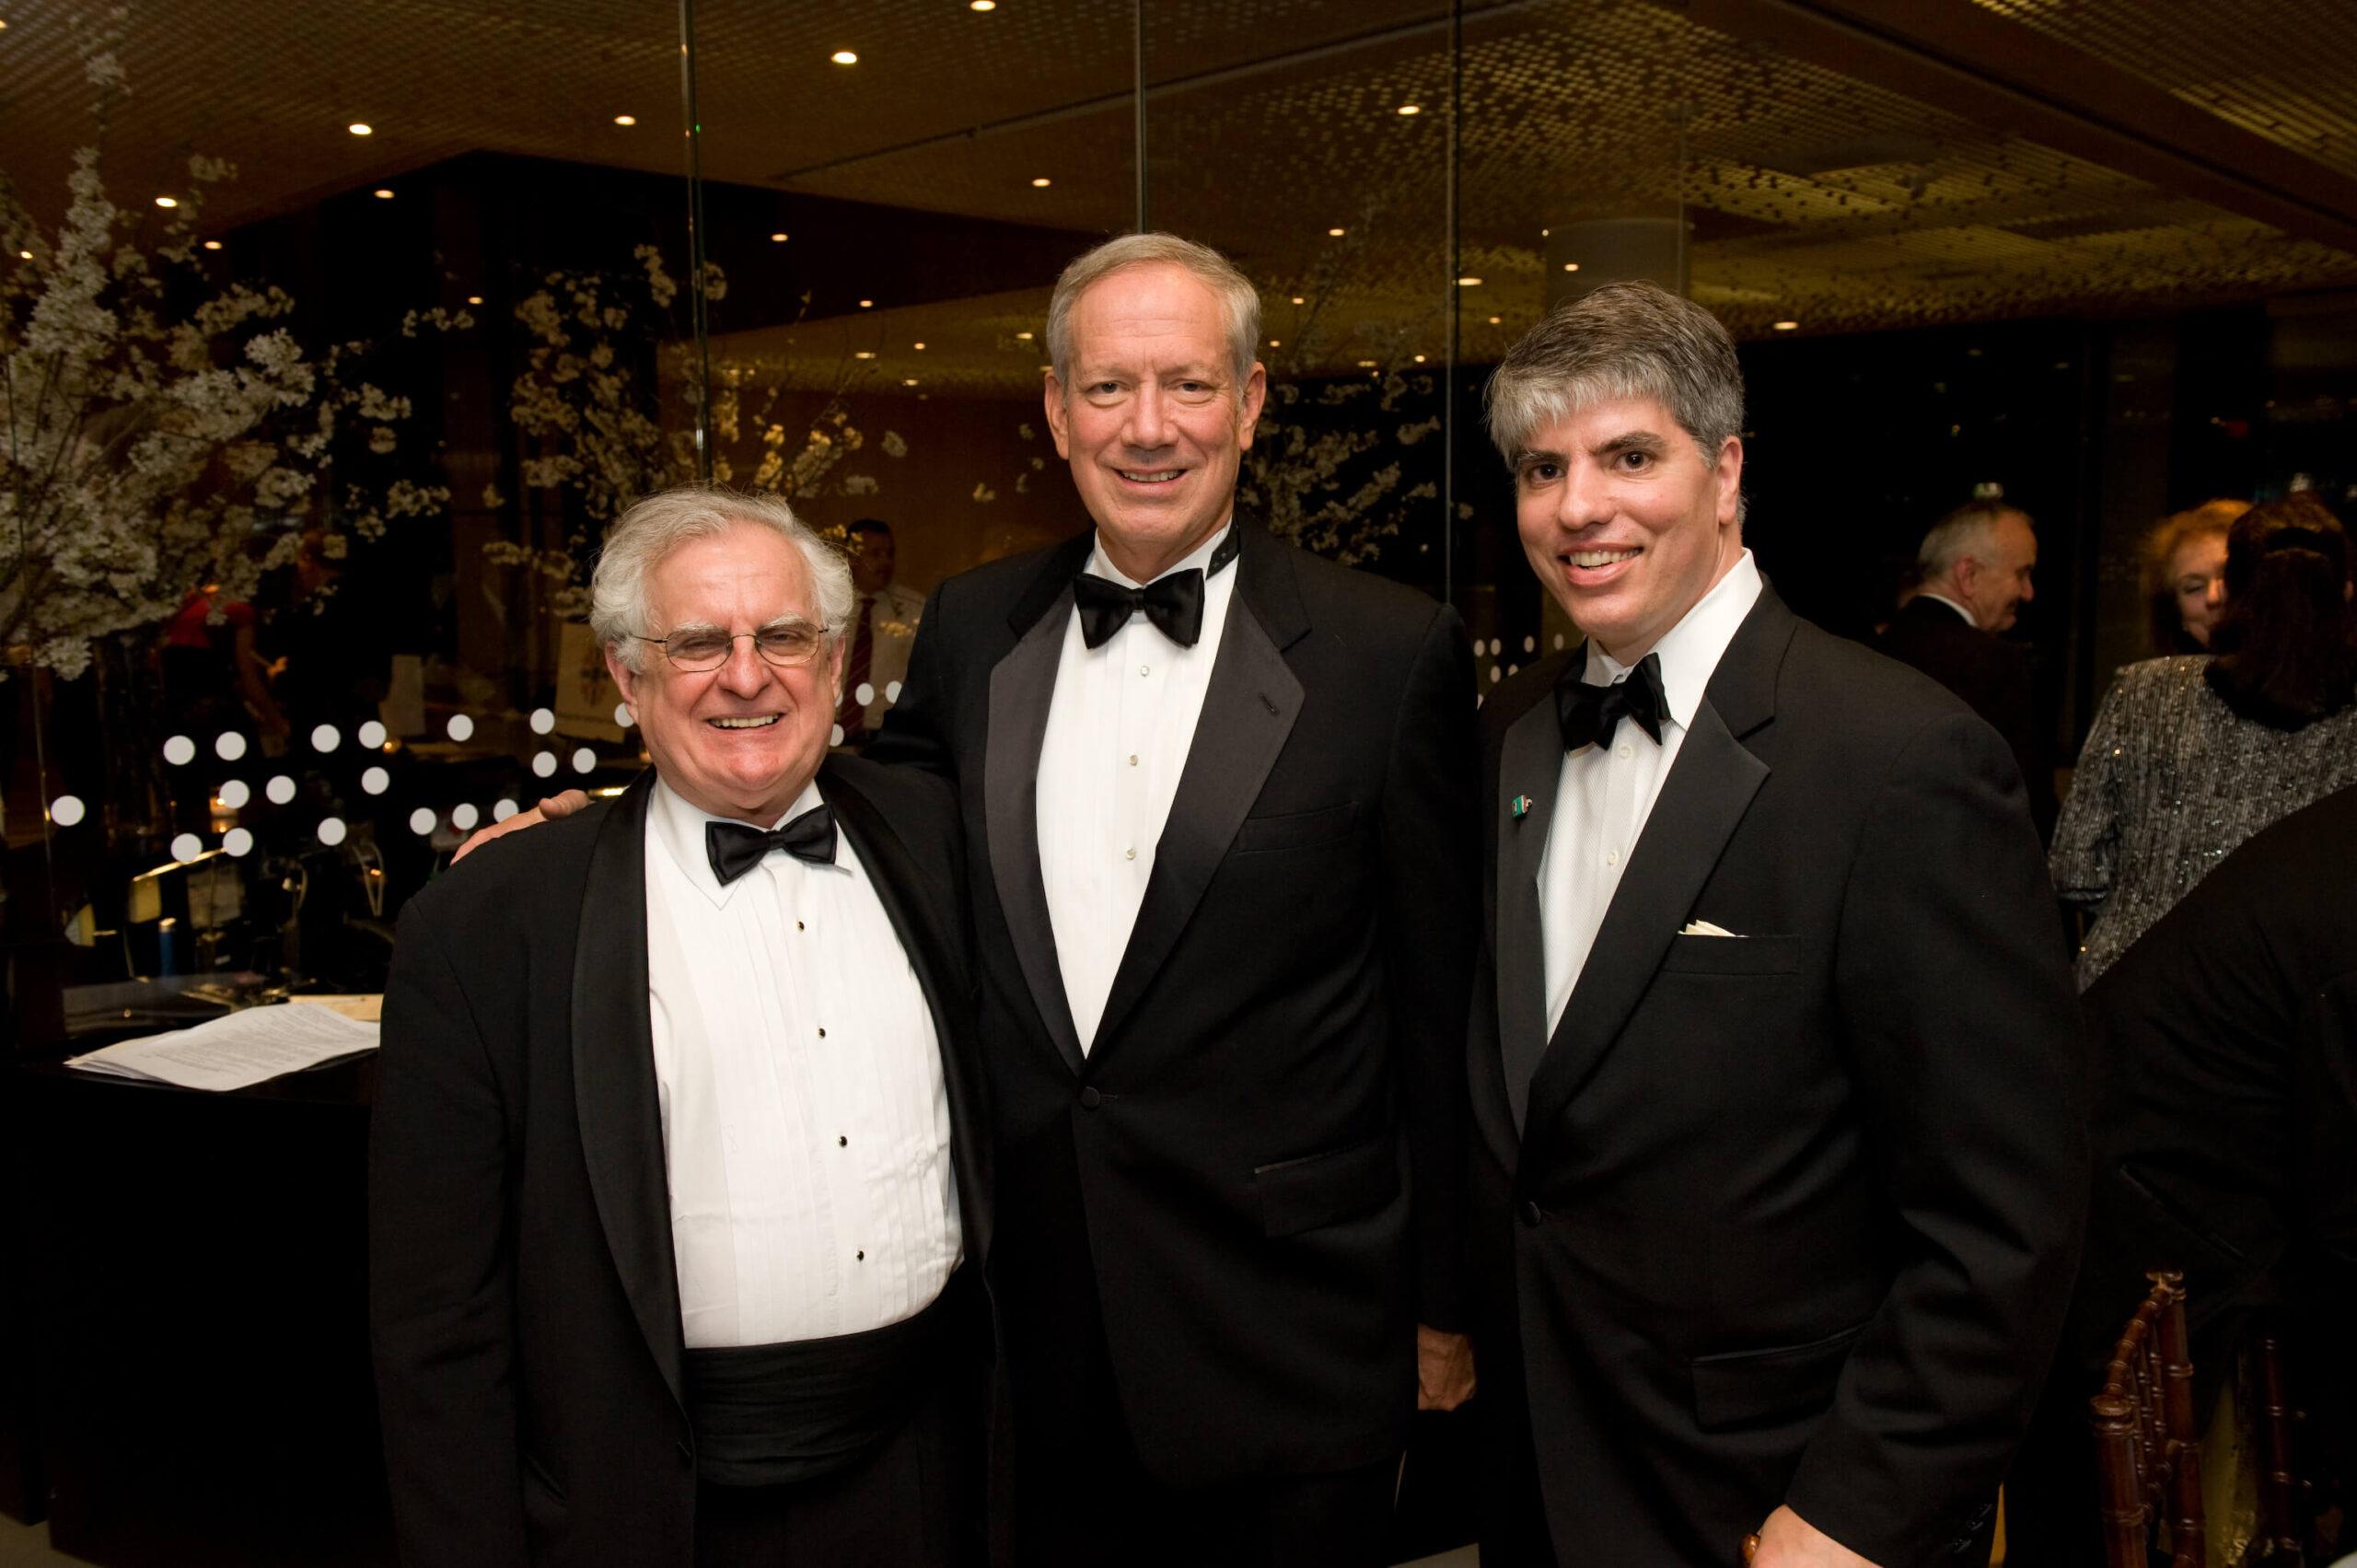 Mr. Zsolt Szekeres, Governor George Pataki, Mr. Maximilian N. Teleki